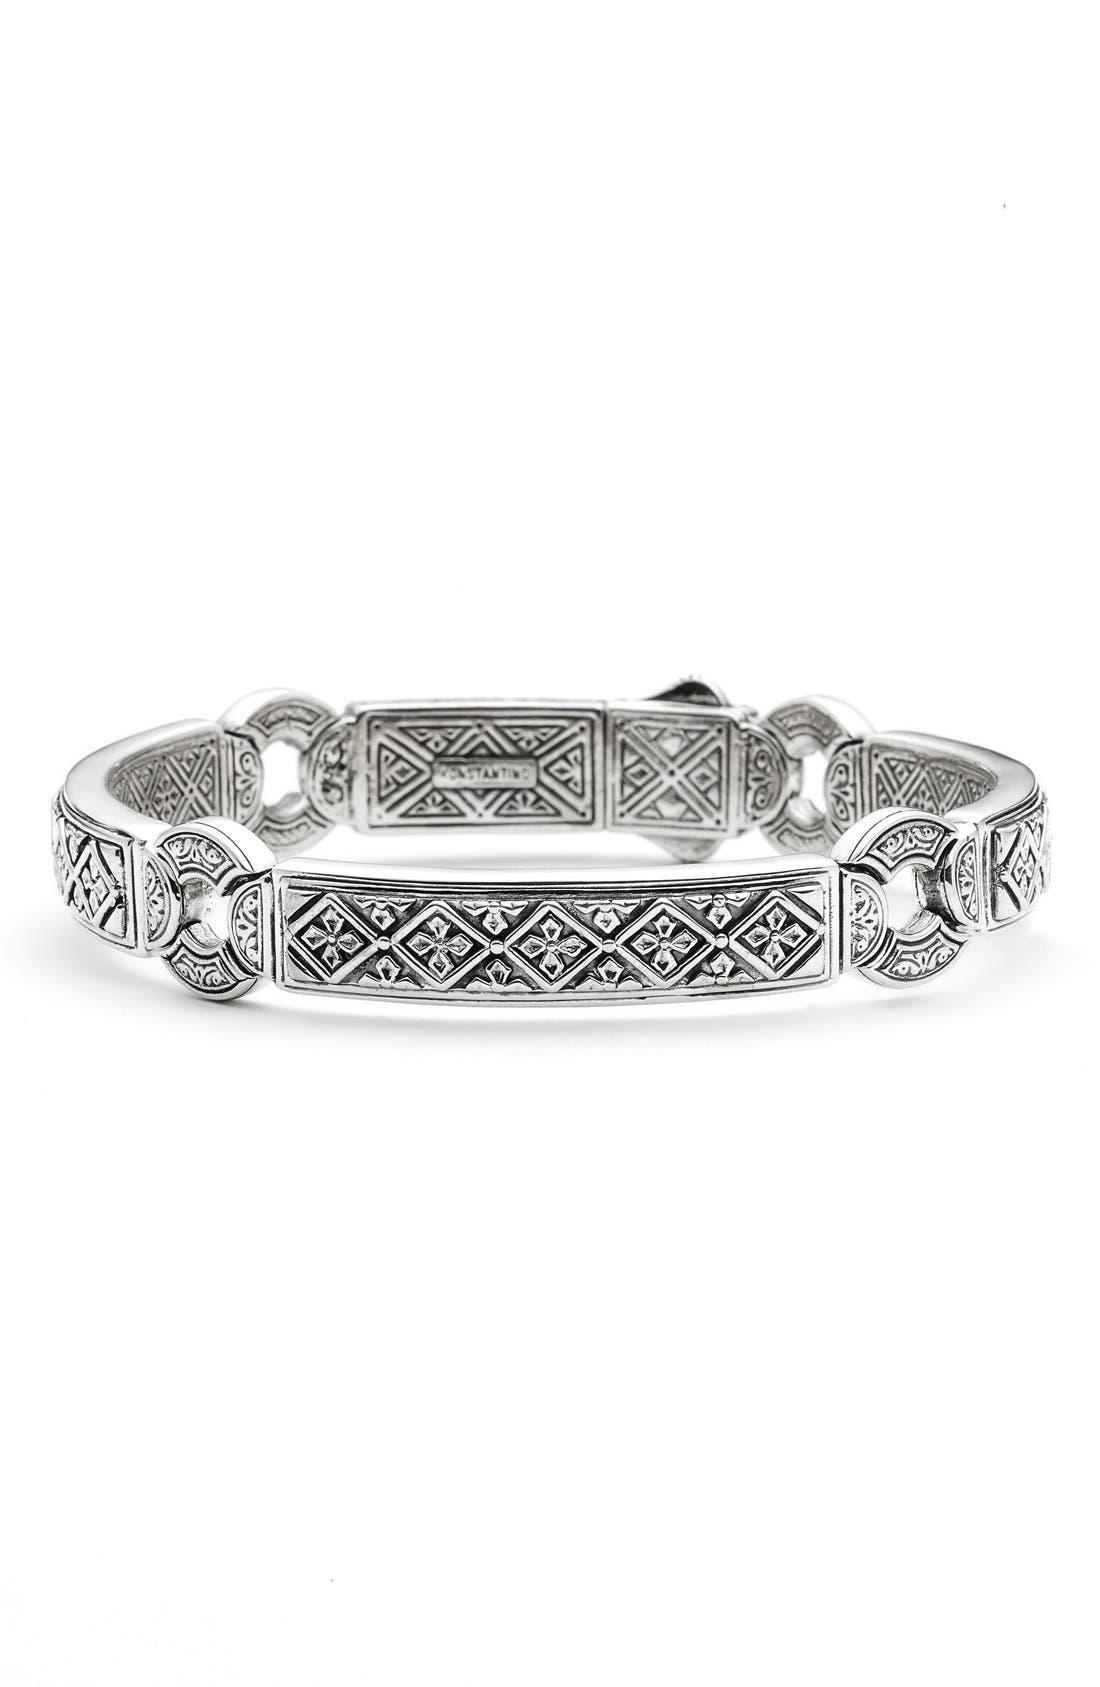 'Silver Classics' Bracelet,                             Main thumbnail 1, color,                             040